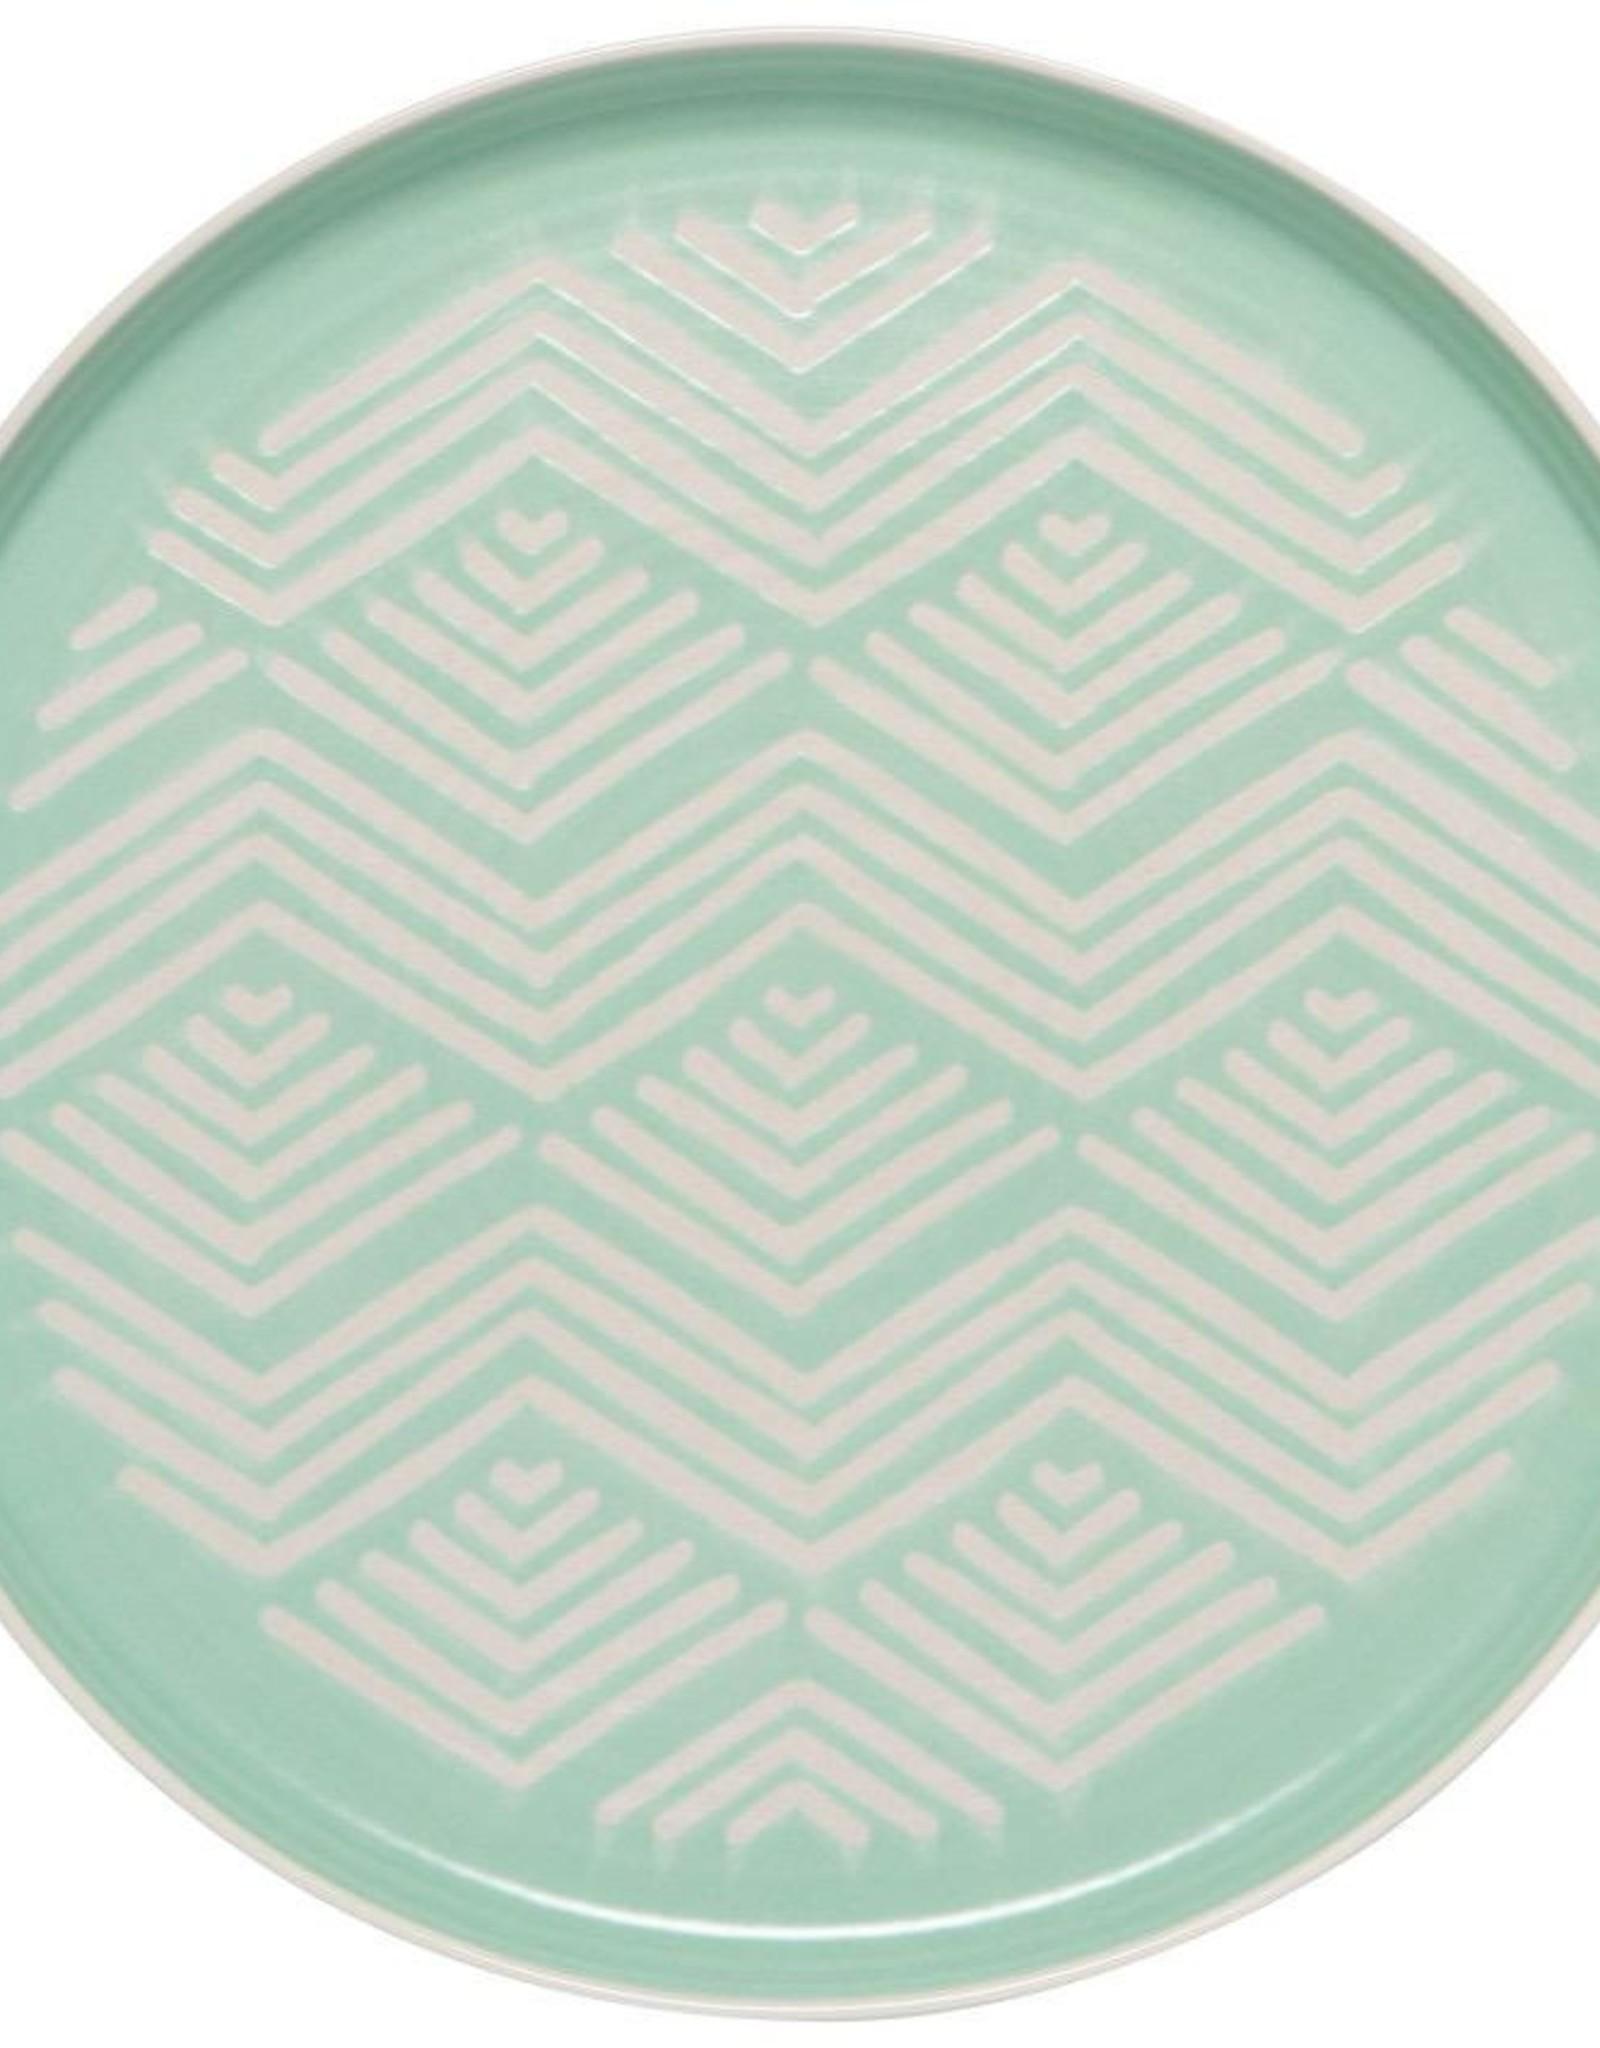 Imprint Dinner Plate - Mint